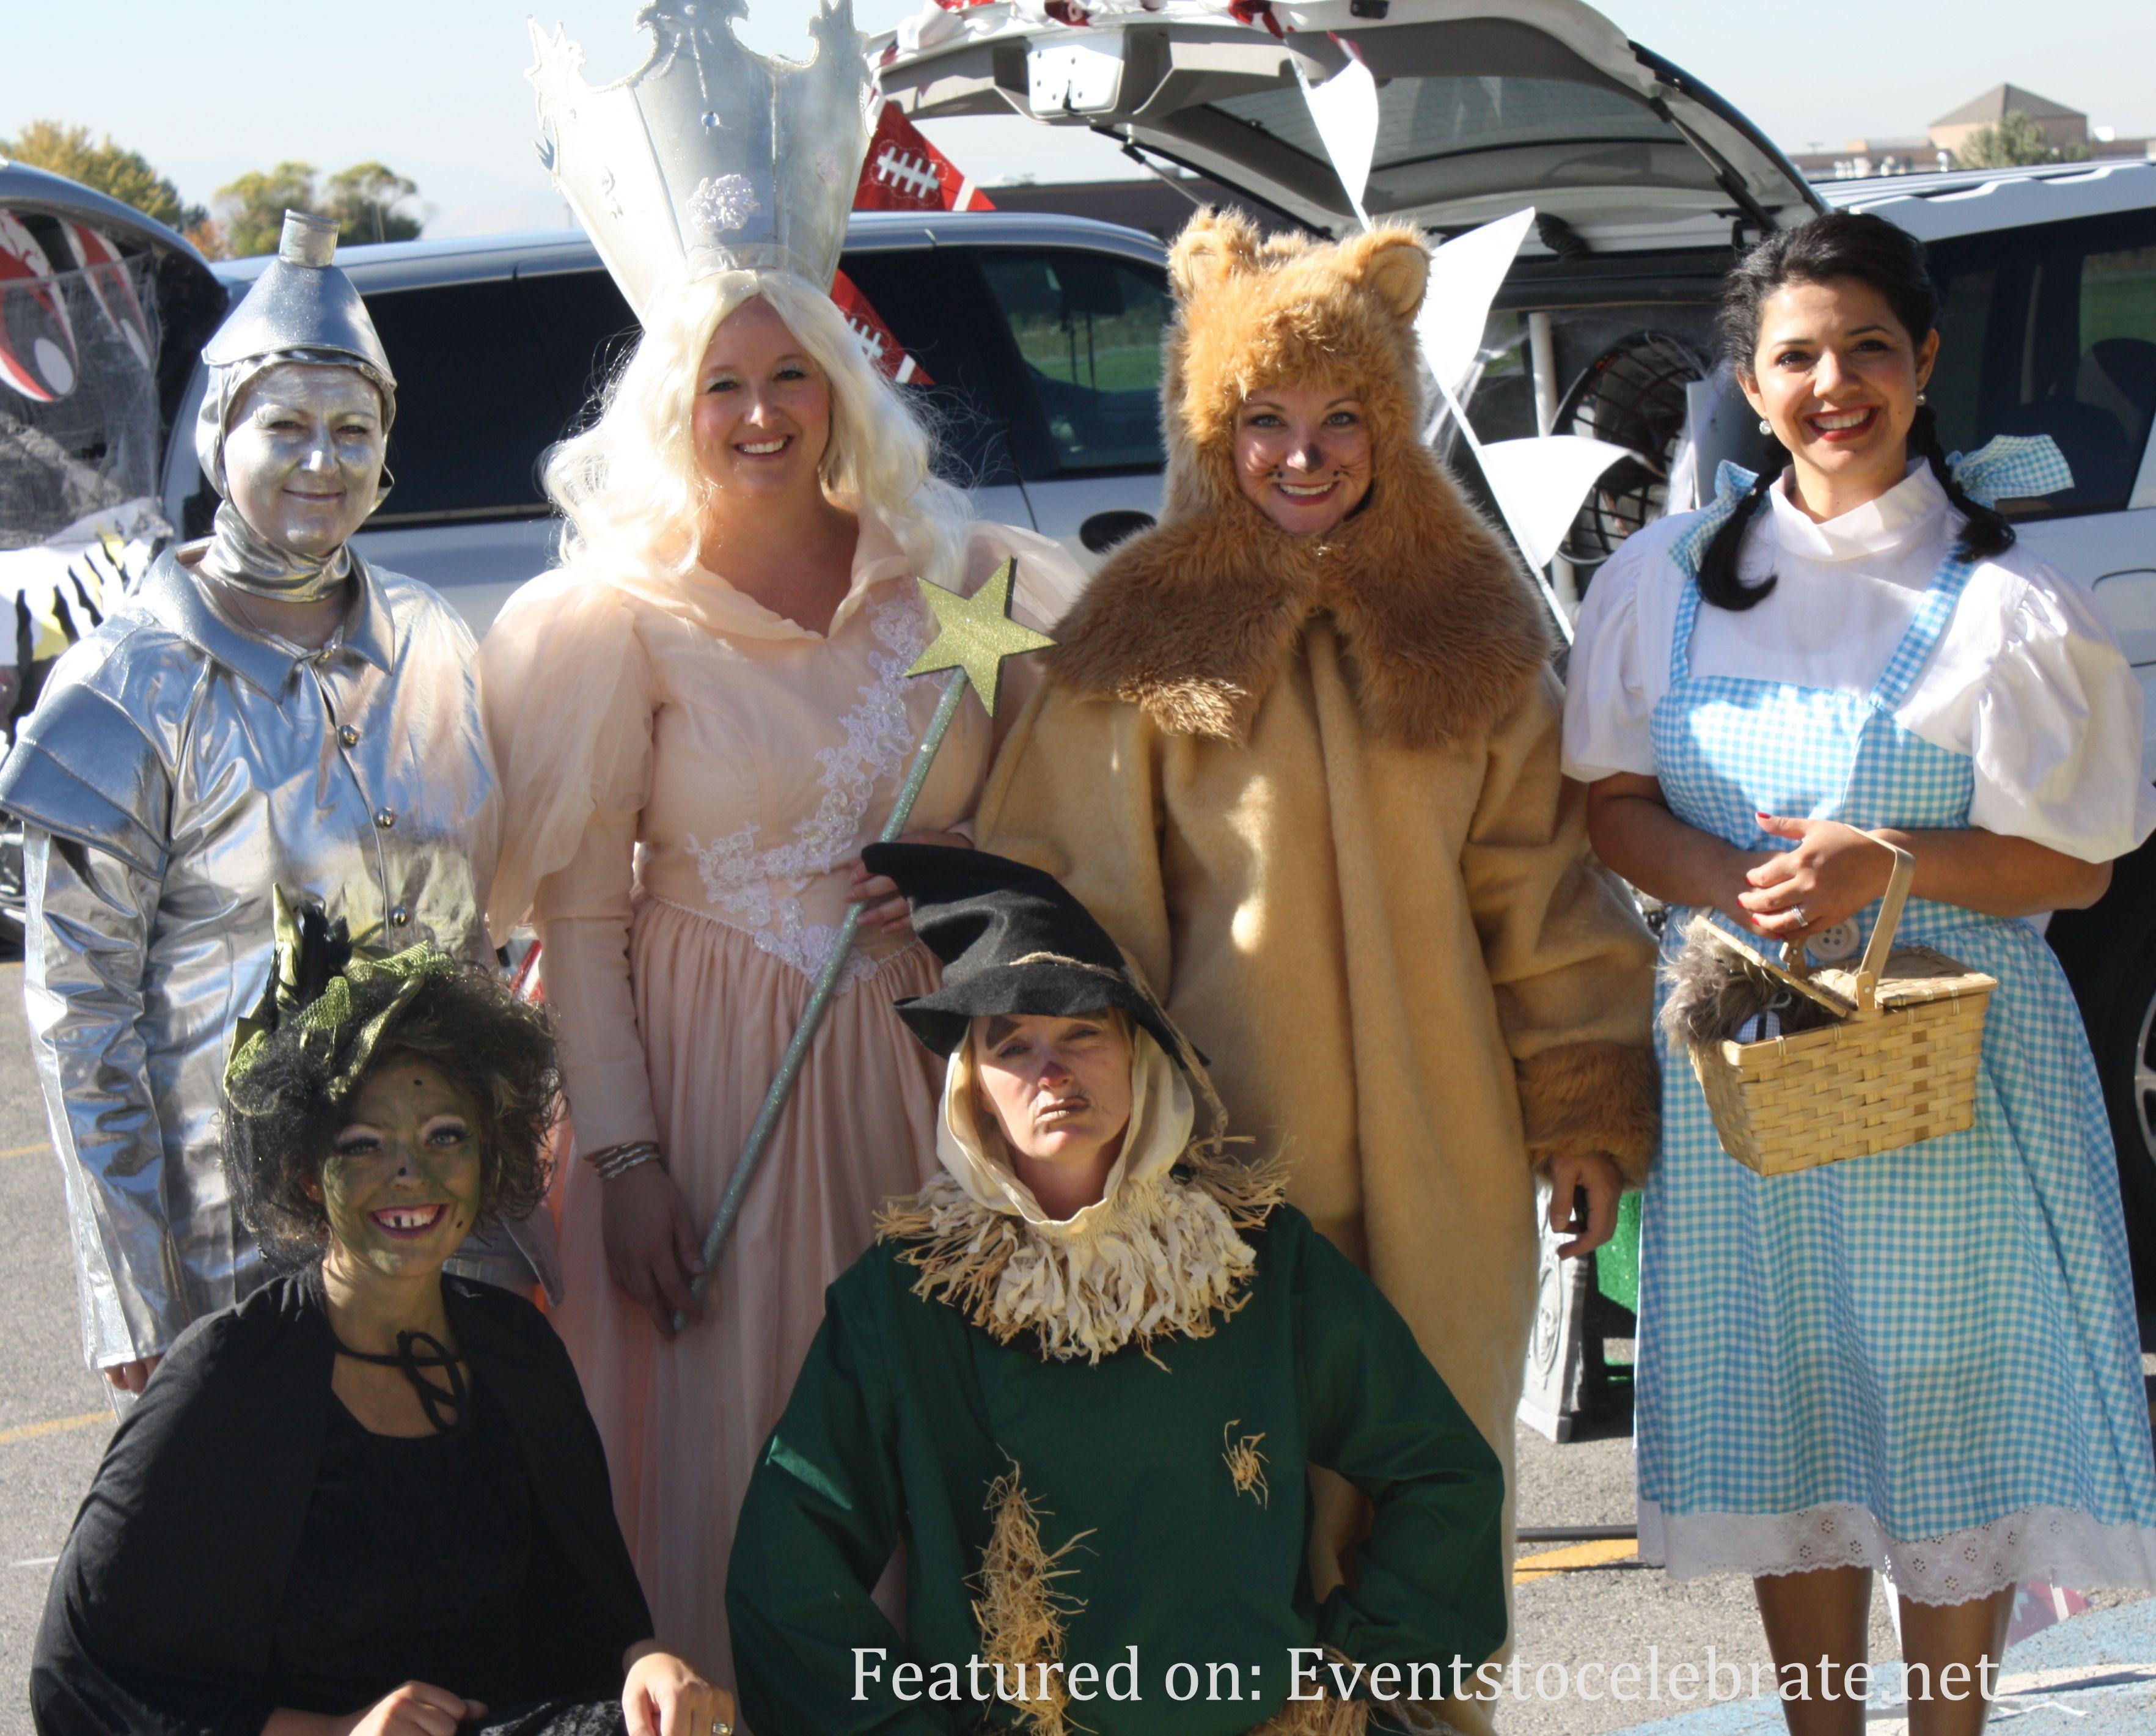 Wizard of Oz Group Halloween Costumes | Halloween Costumes ...